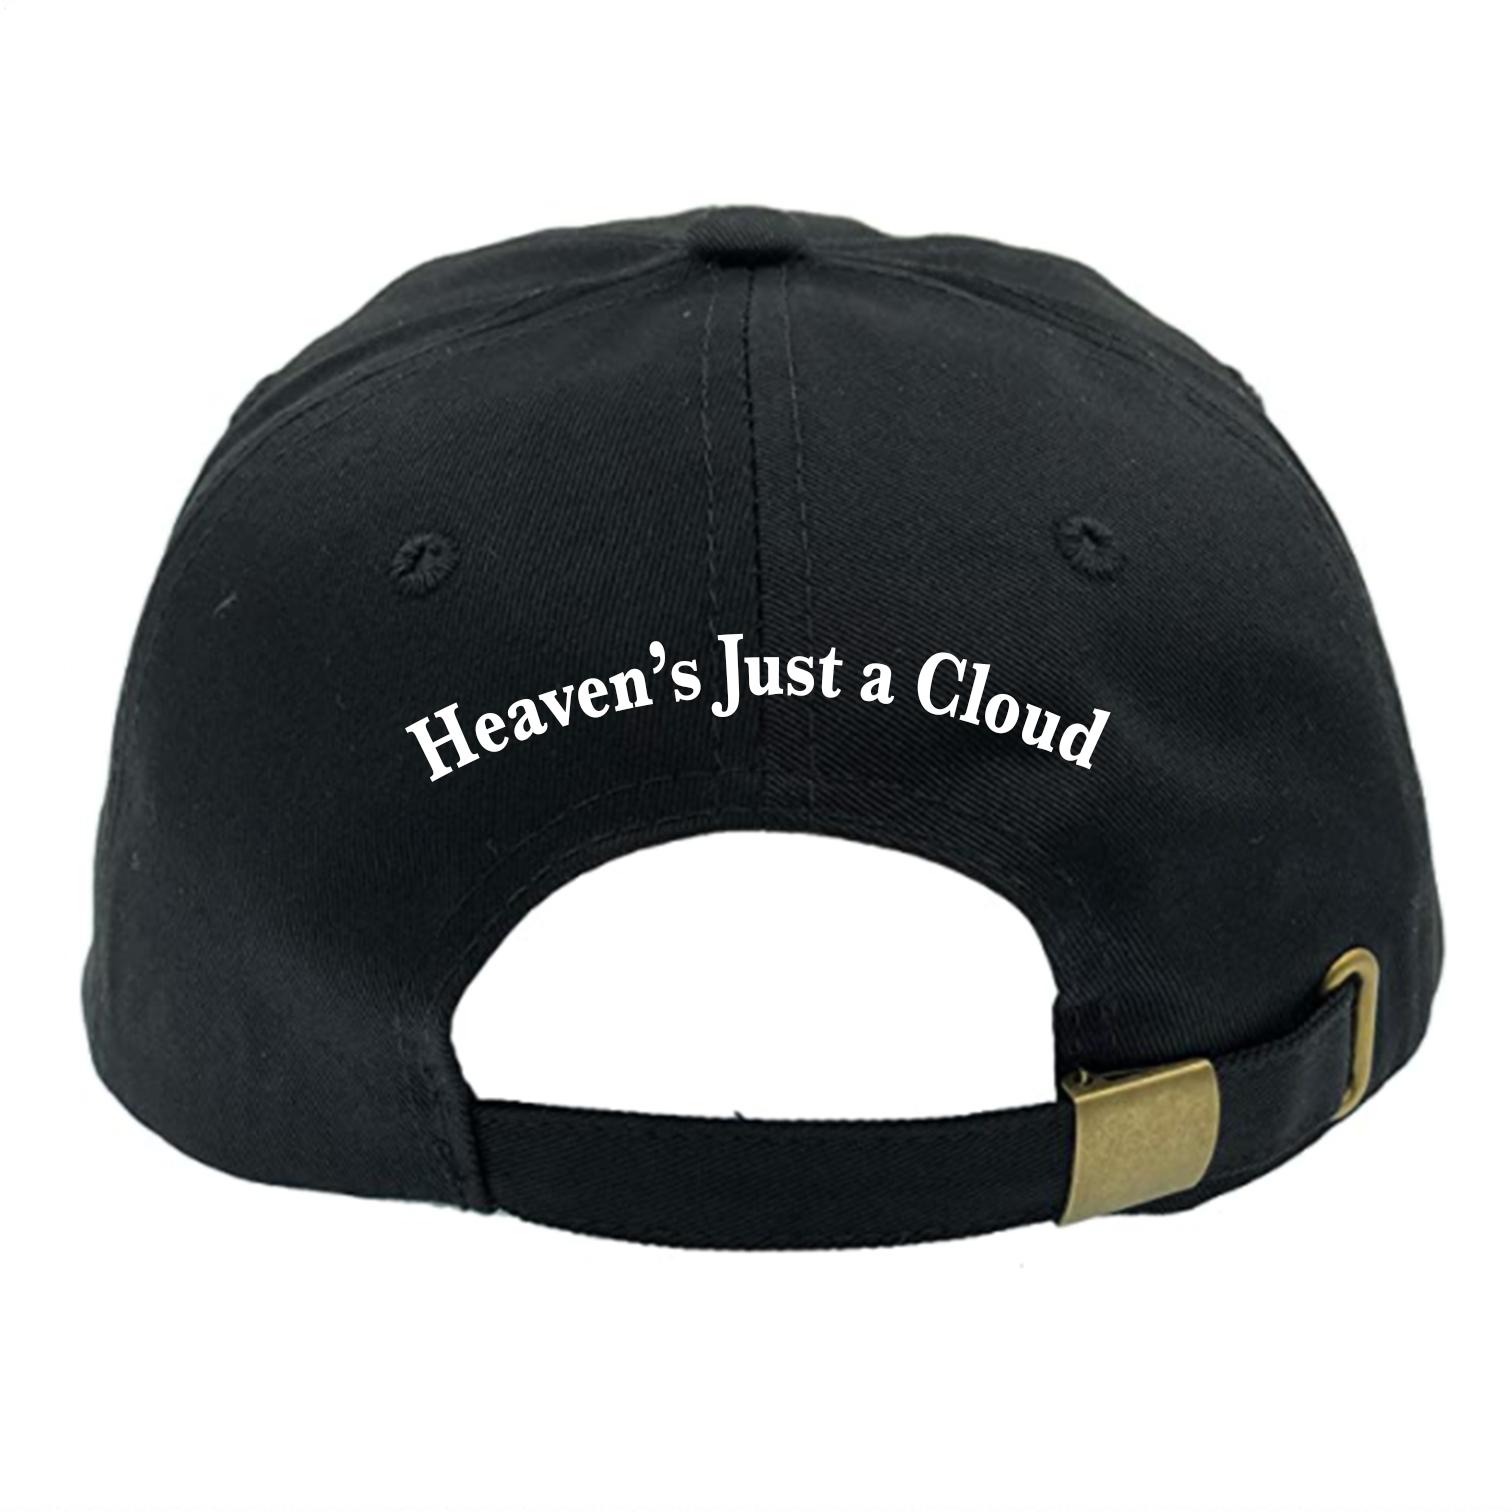 Spirit Was - Heaven's Just a Cloud